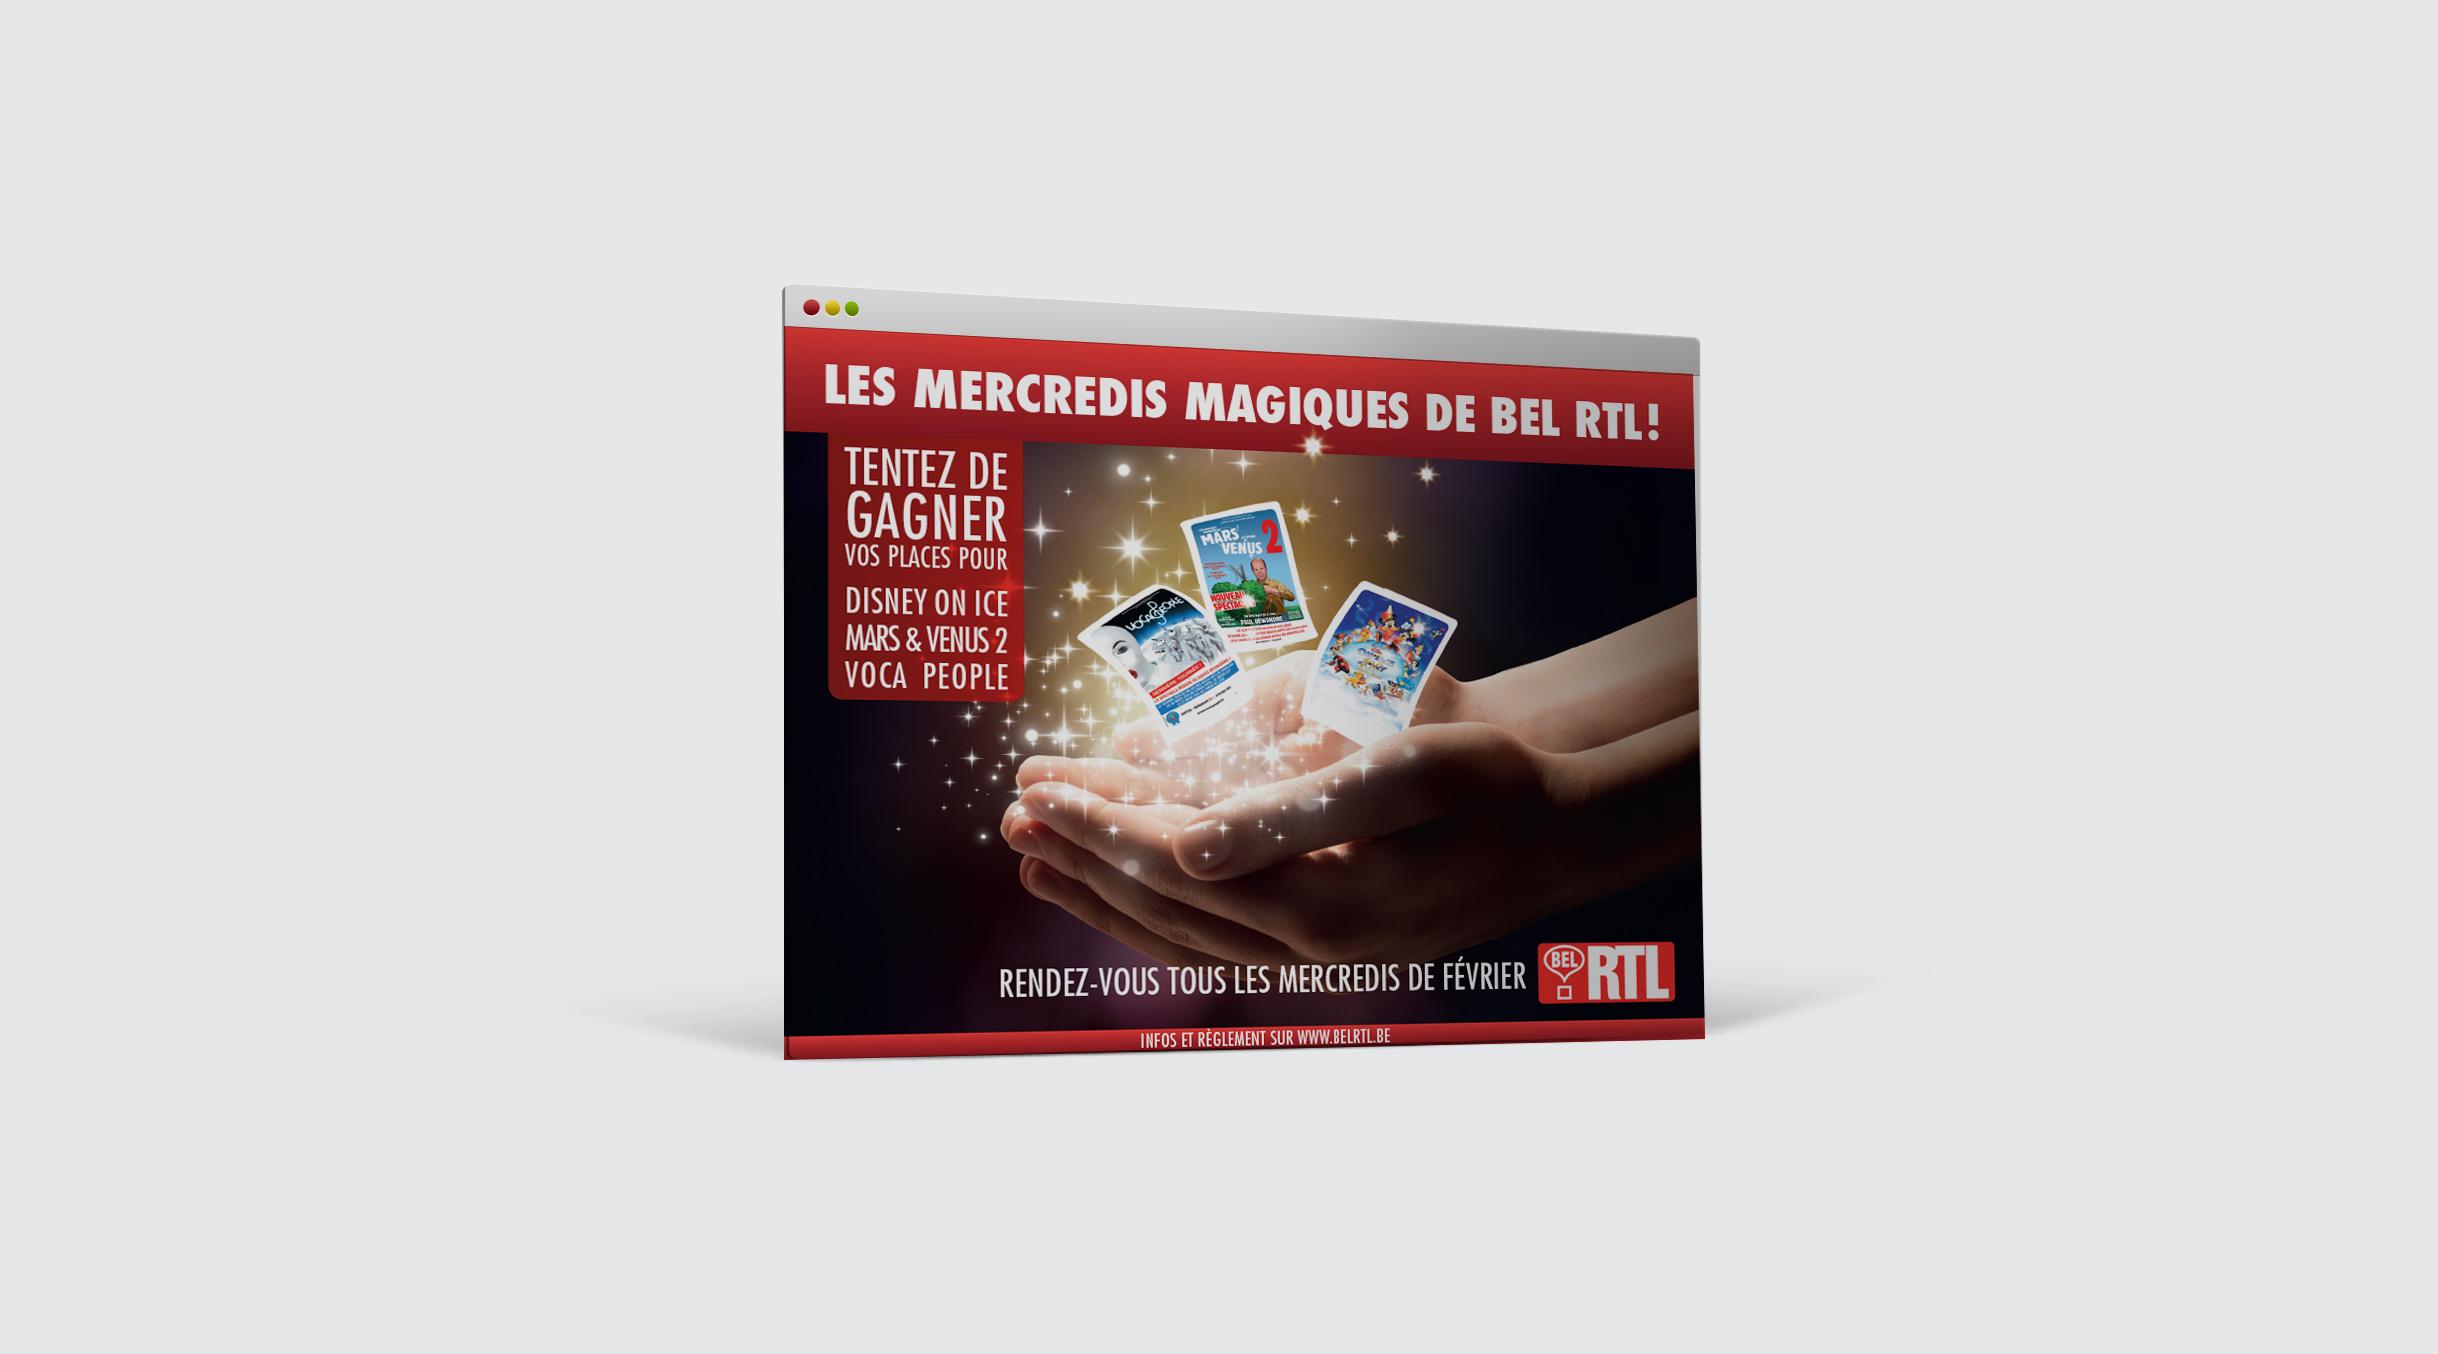 BEL RTL mercredi magique 2